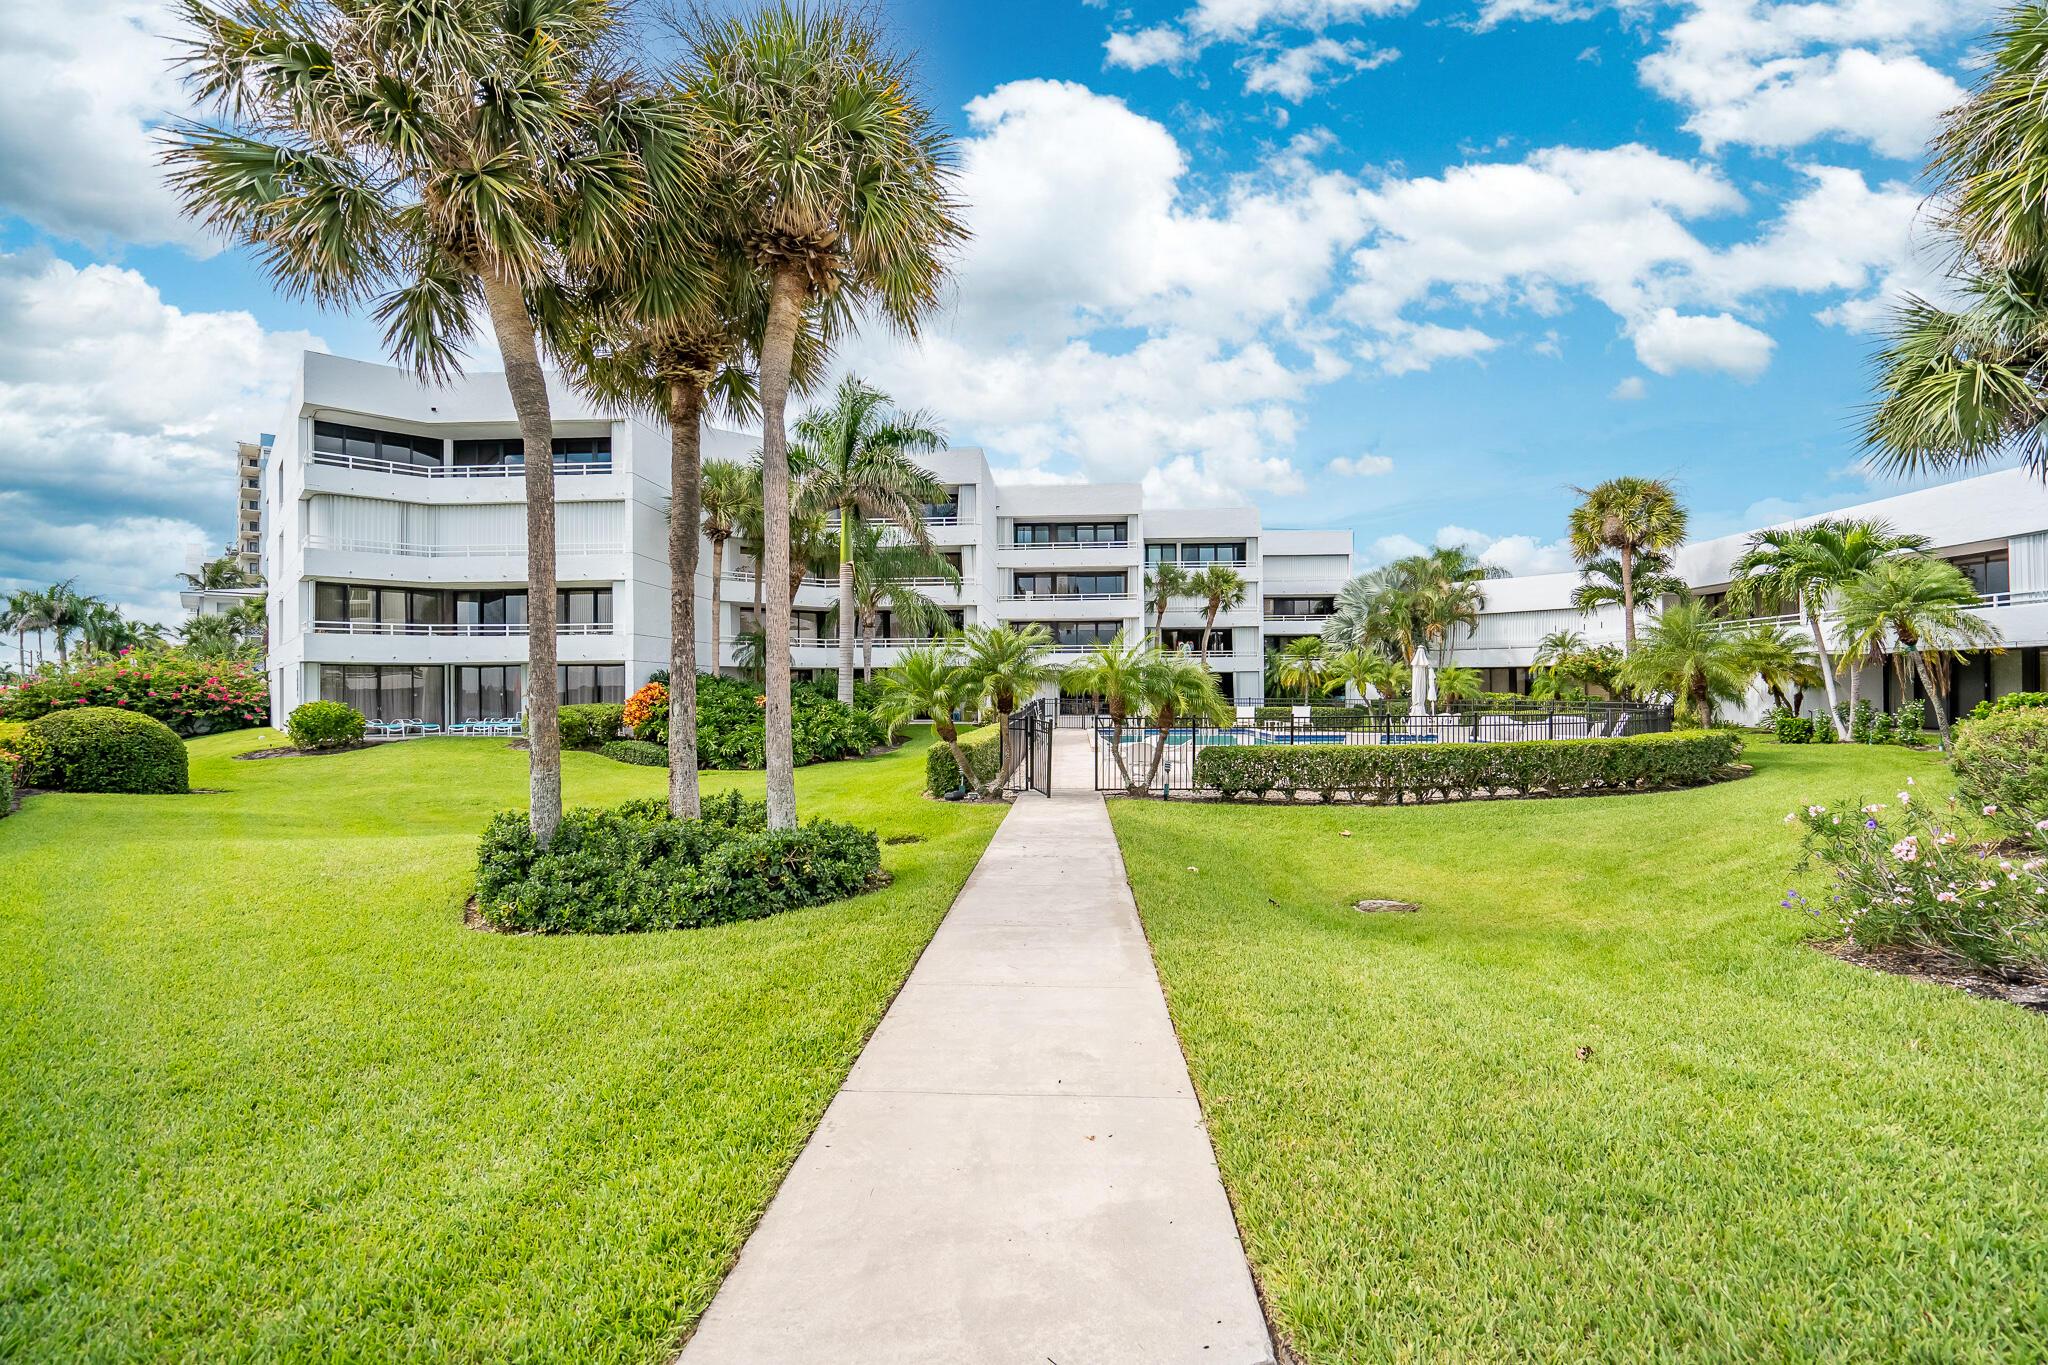 3701 S Flagler Drive B204 West Palm Beach, FL 33405 photo 2